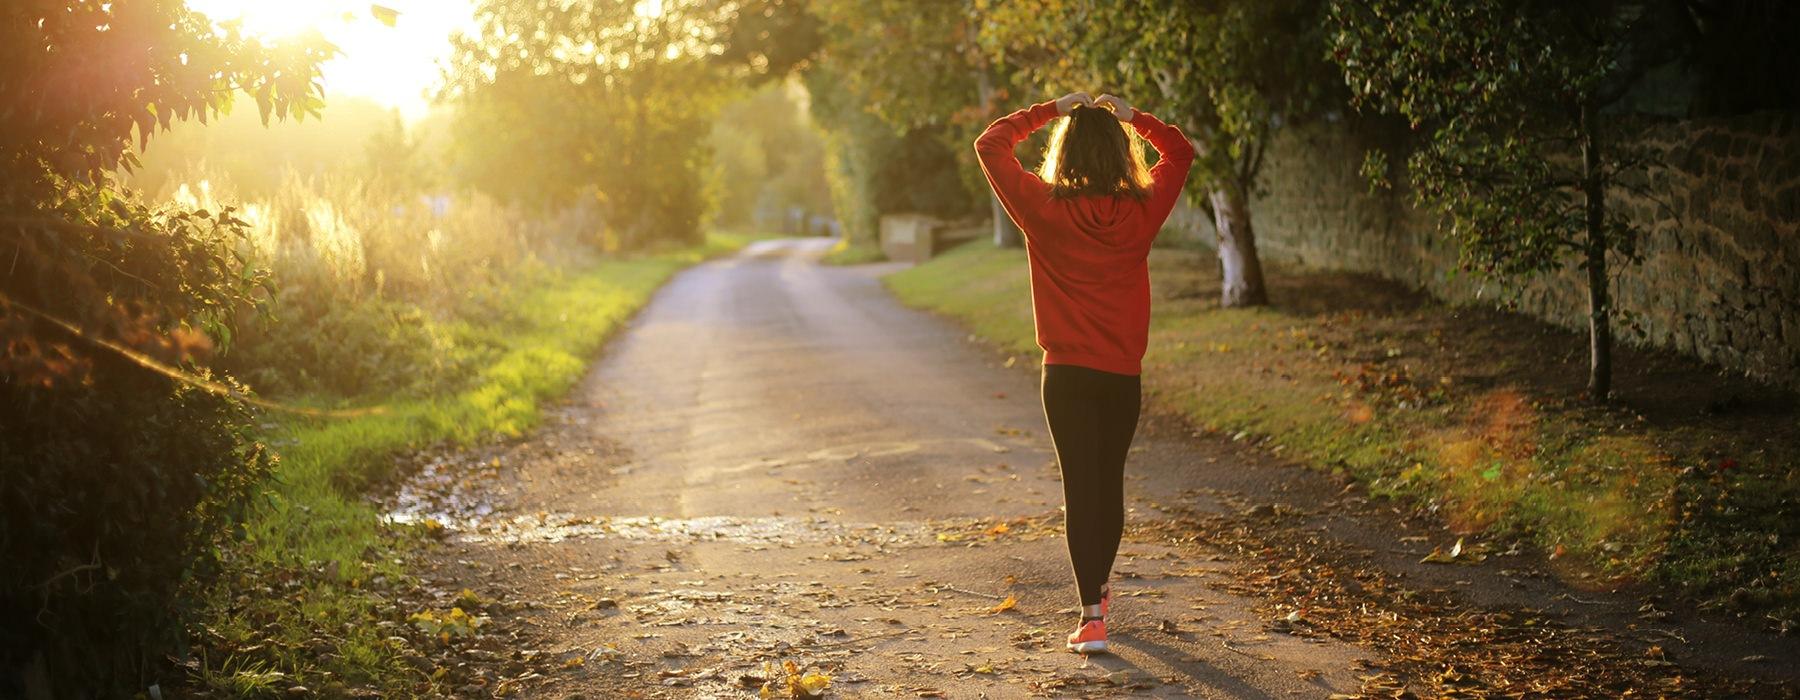 woman in sweats, walking down a country dirt road toward the setting sun